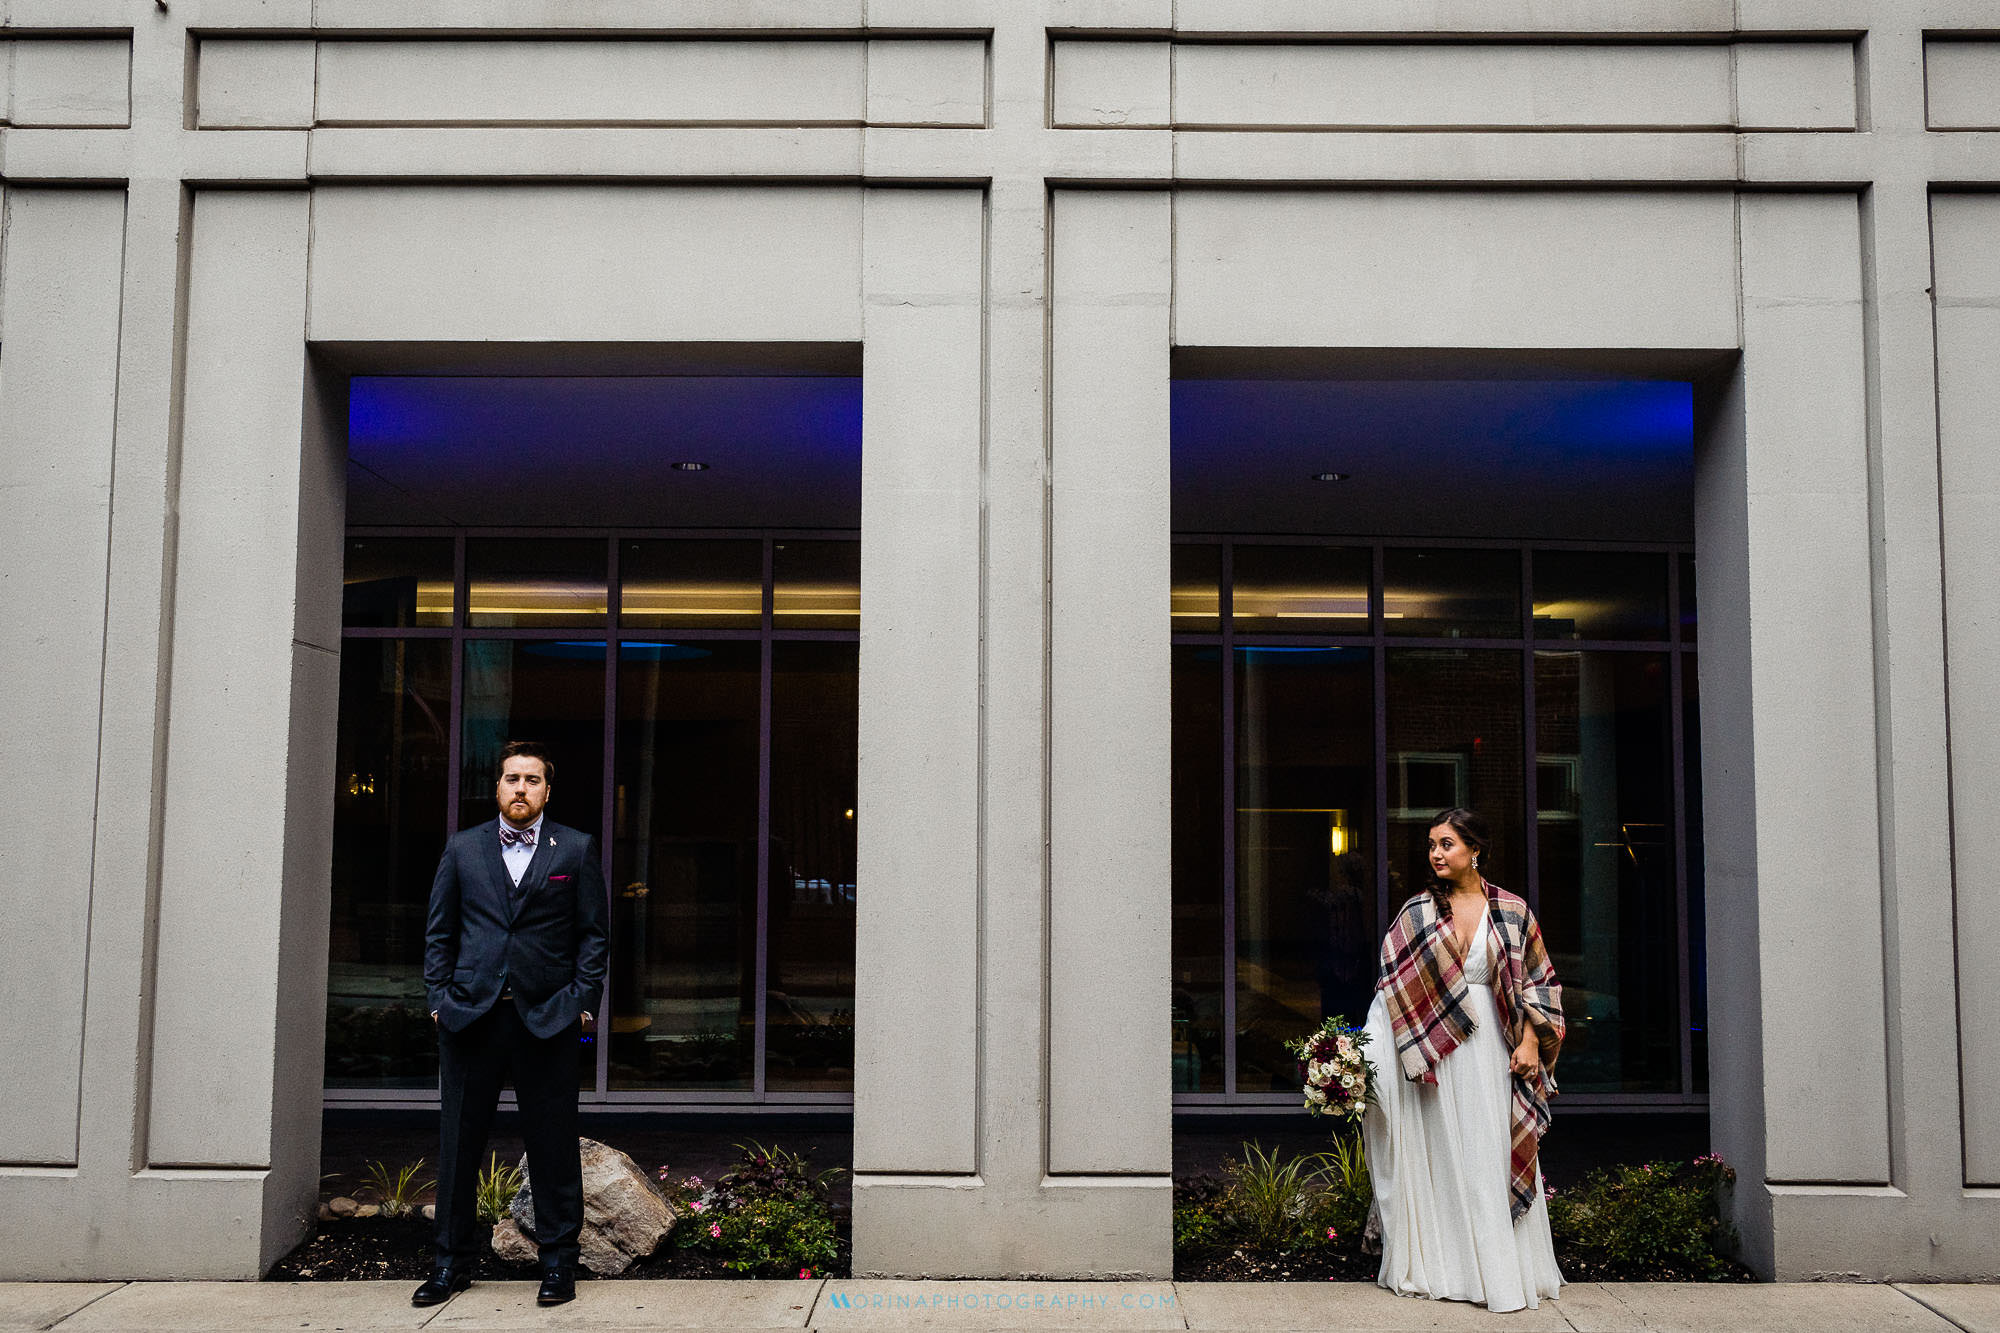 Yuki & Michael Wedding at Morris House Hotel Blog 0053.jpg